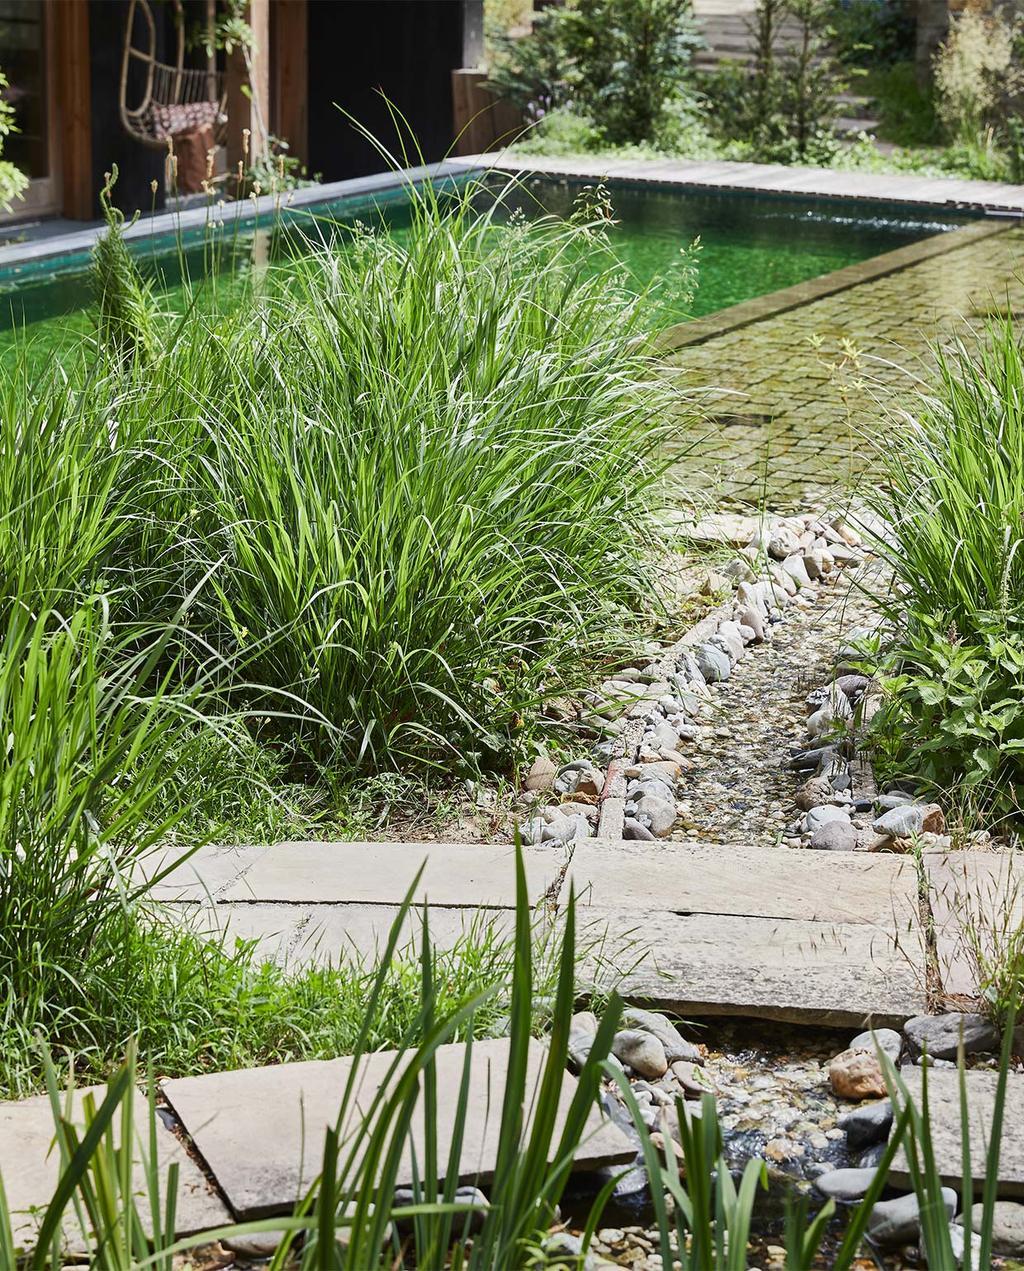 vtwonen special tuin 03 2021 | vierkante zwemvijver